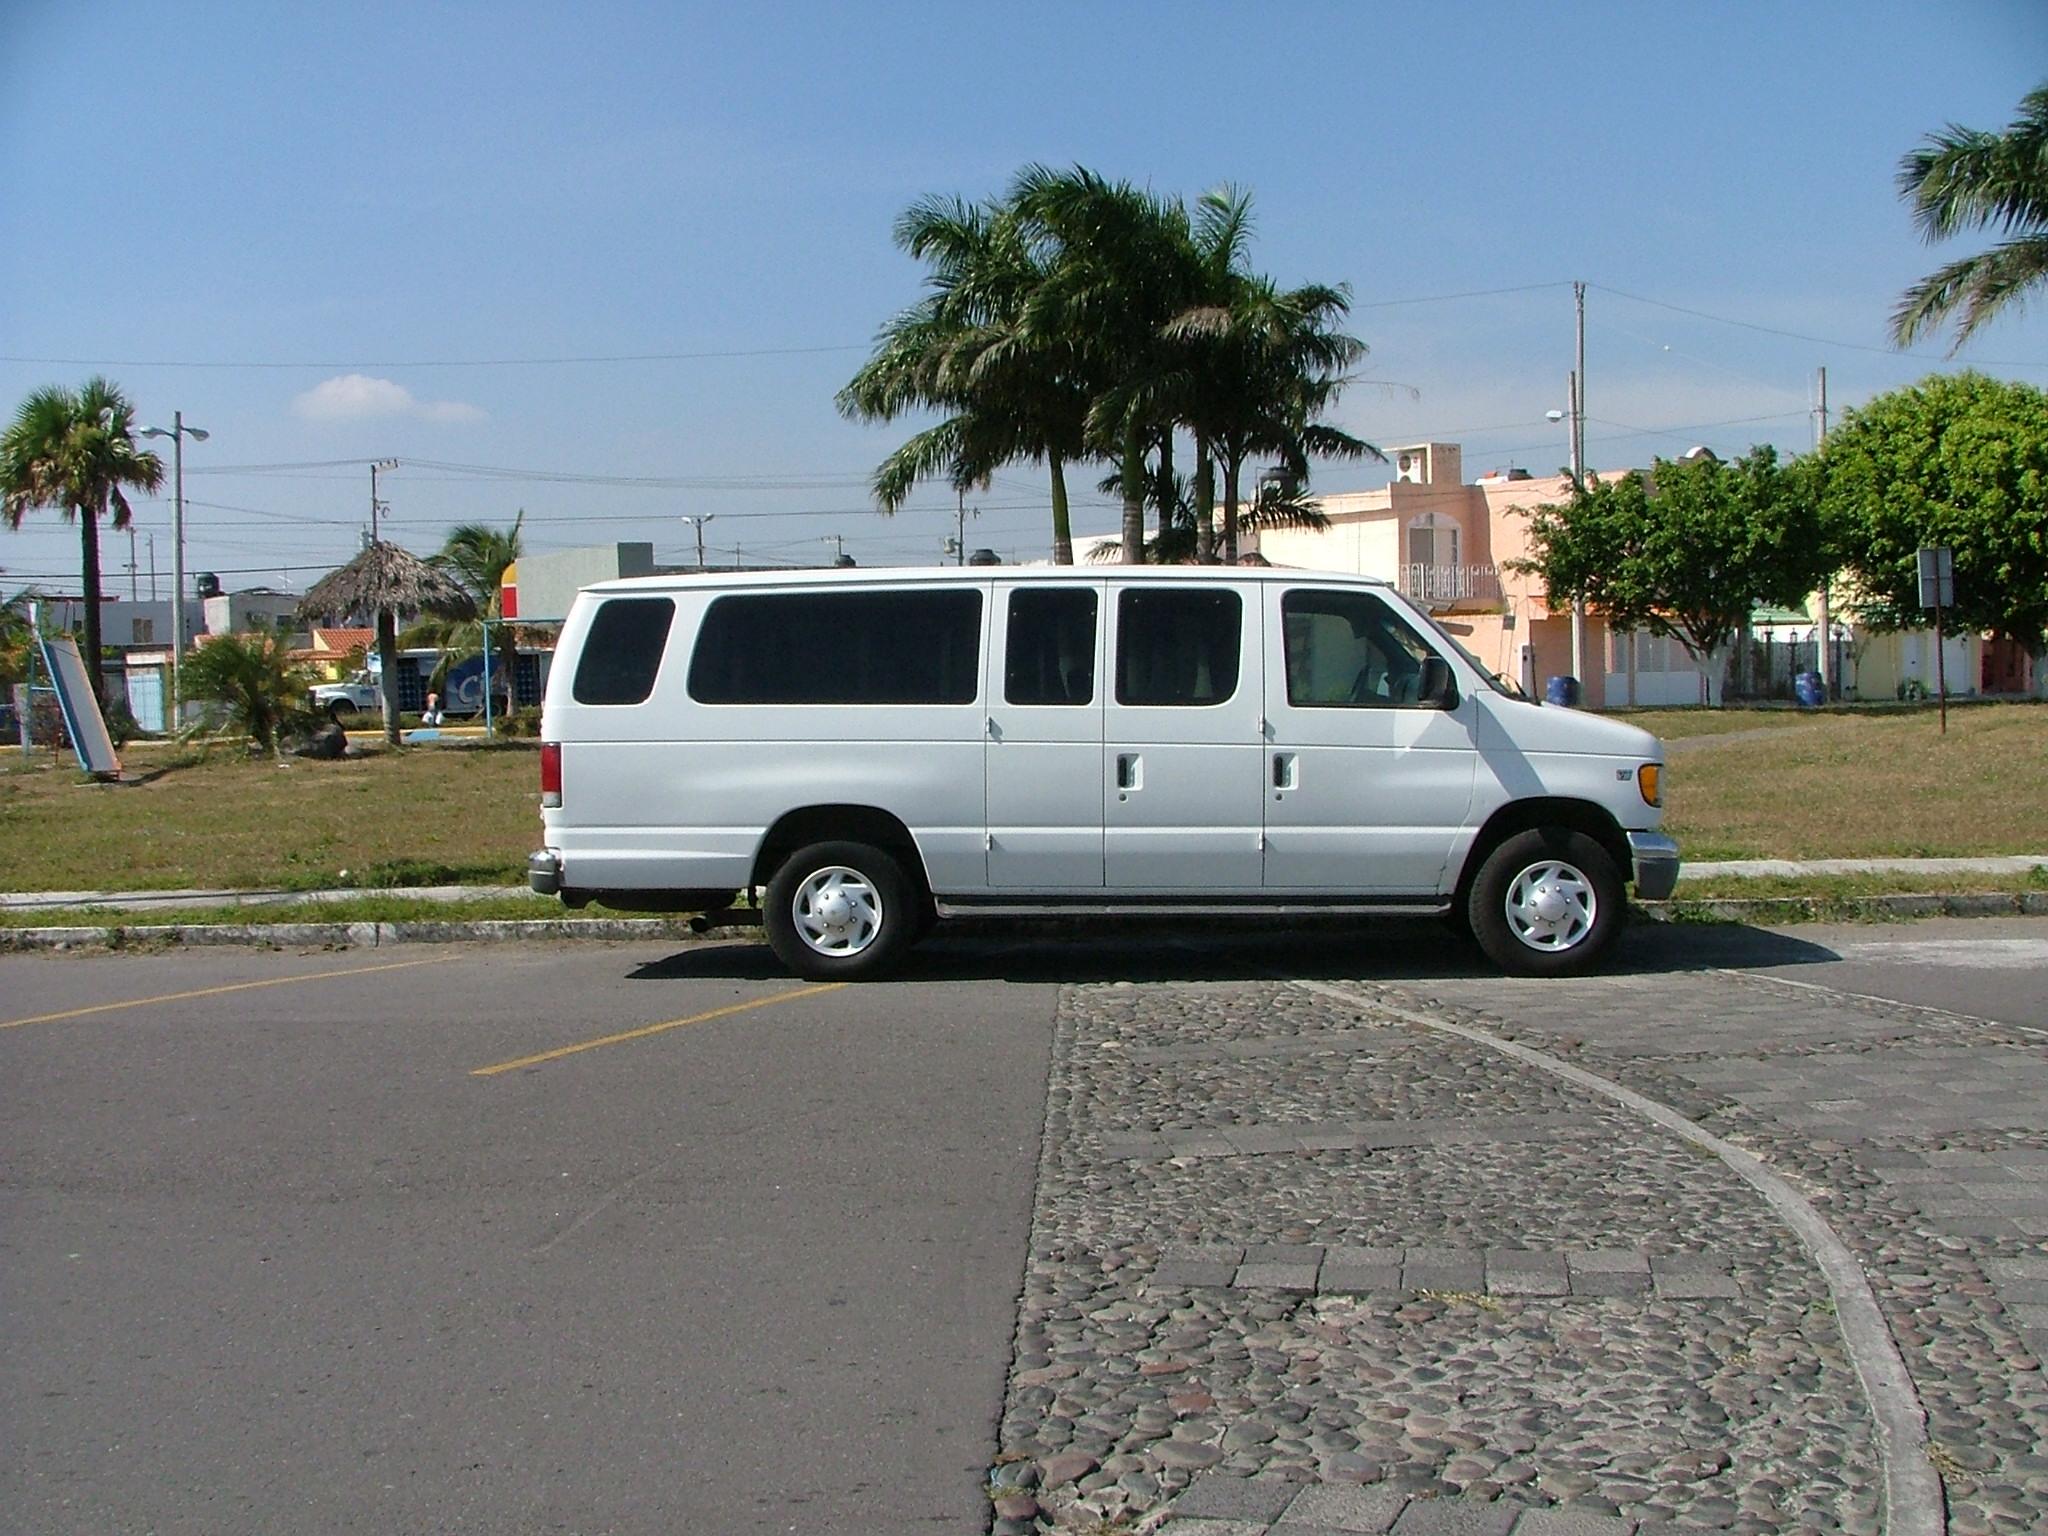 Unidades Camionetas Maxi Van Transportacion Ejecutiva Veracruz